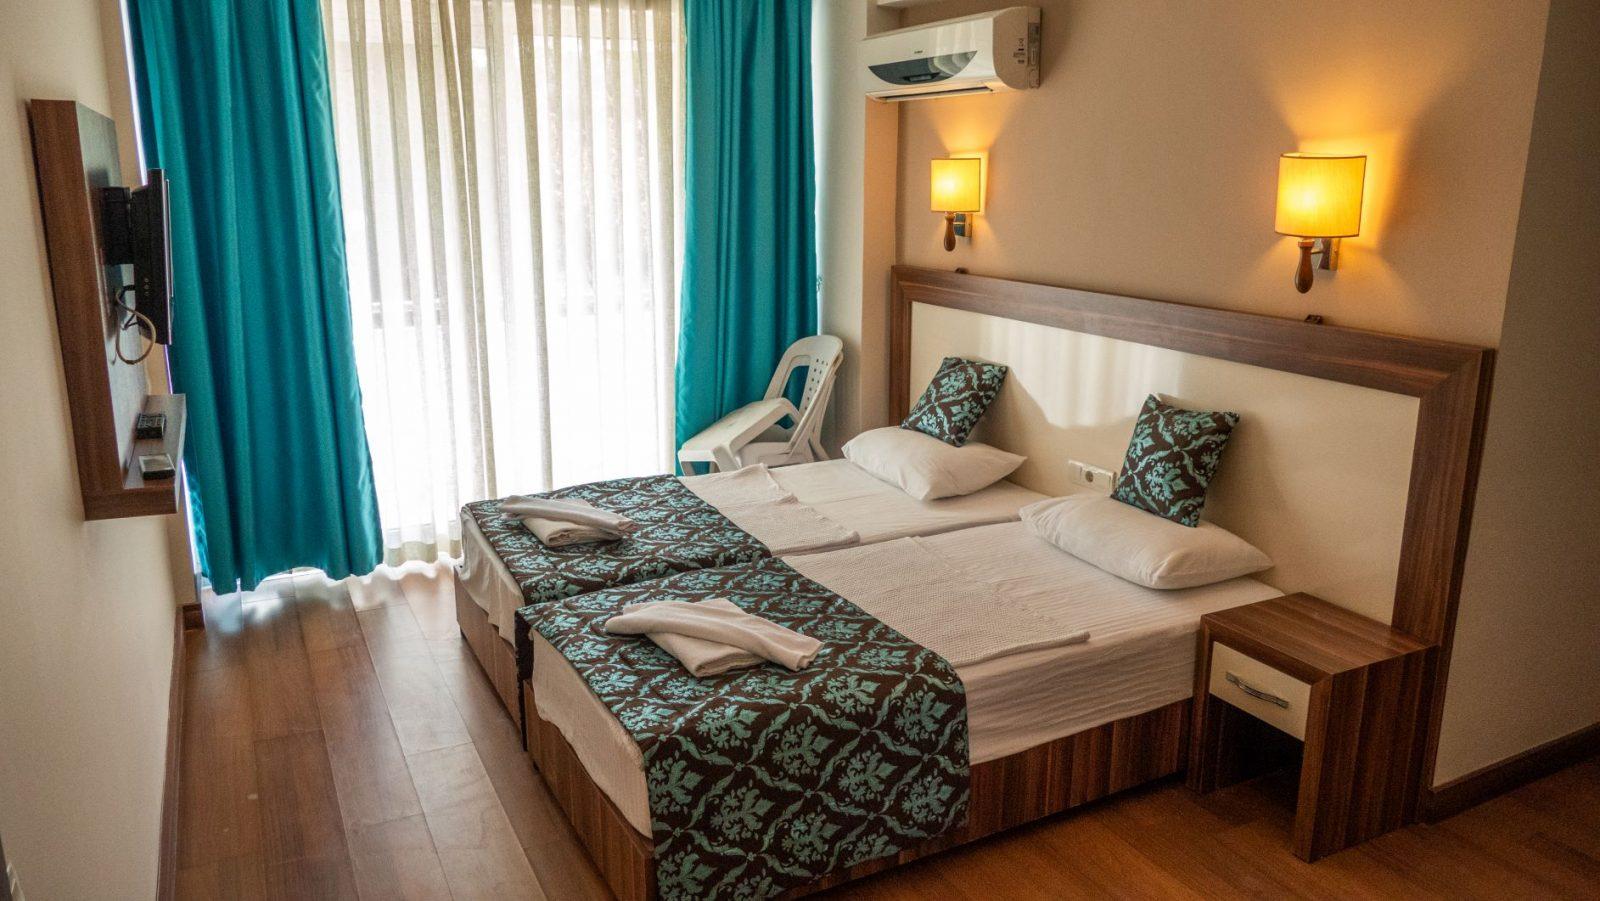 Letovanje Turska autobusom, Kusadasi, a autobusom, Kusadasi, Hotel Roxx Royal ex Santur,izgled sobe